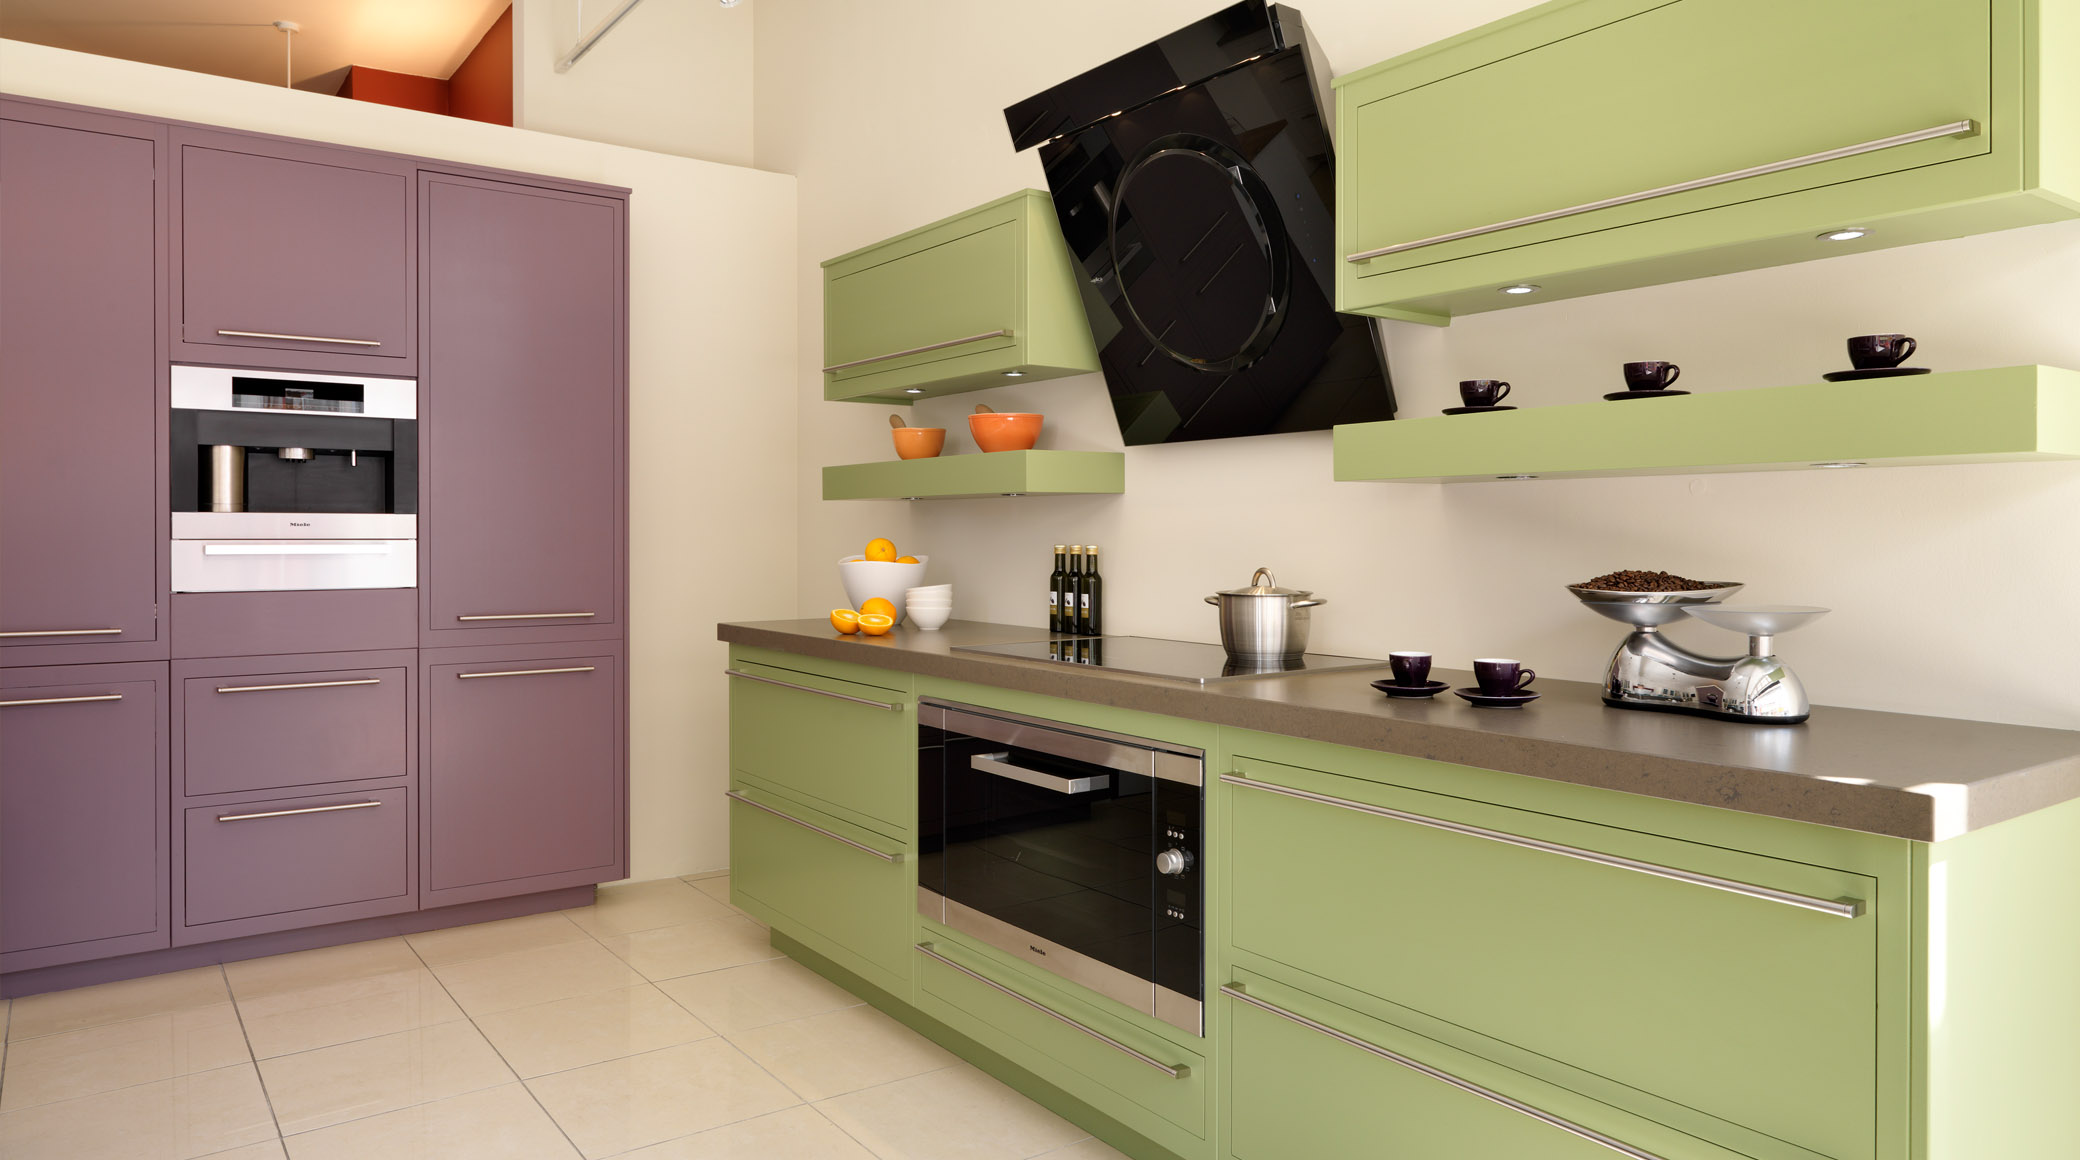 Harvey Jones Award Winning Linear Kitchens Combine Minimalist And Modern Design